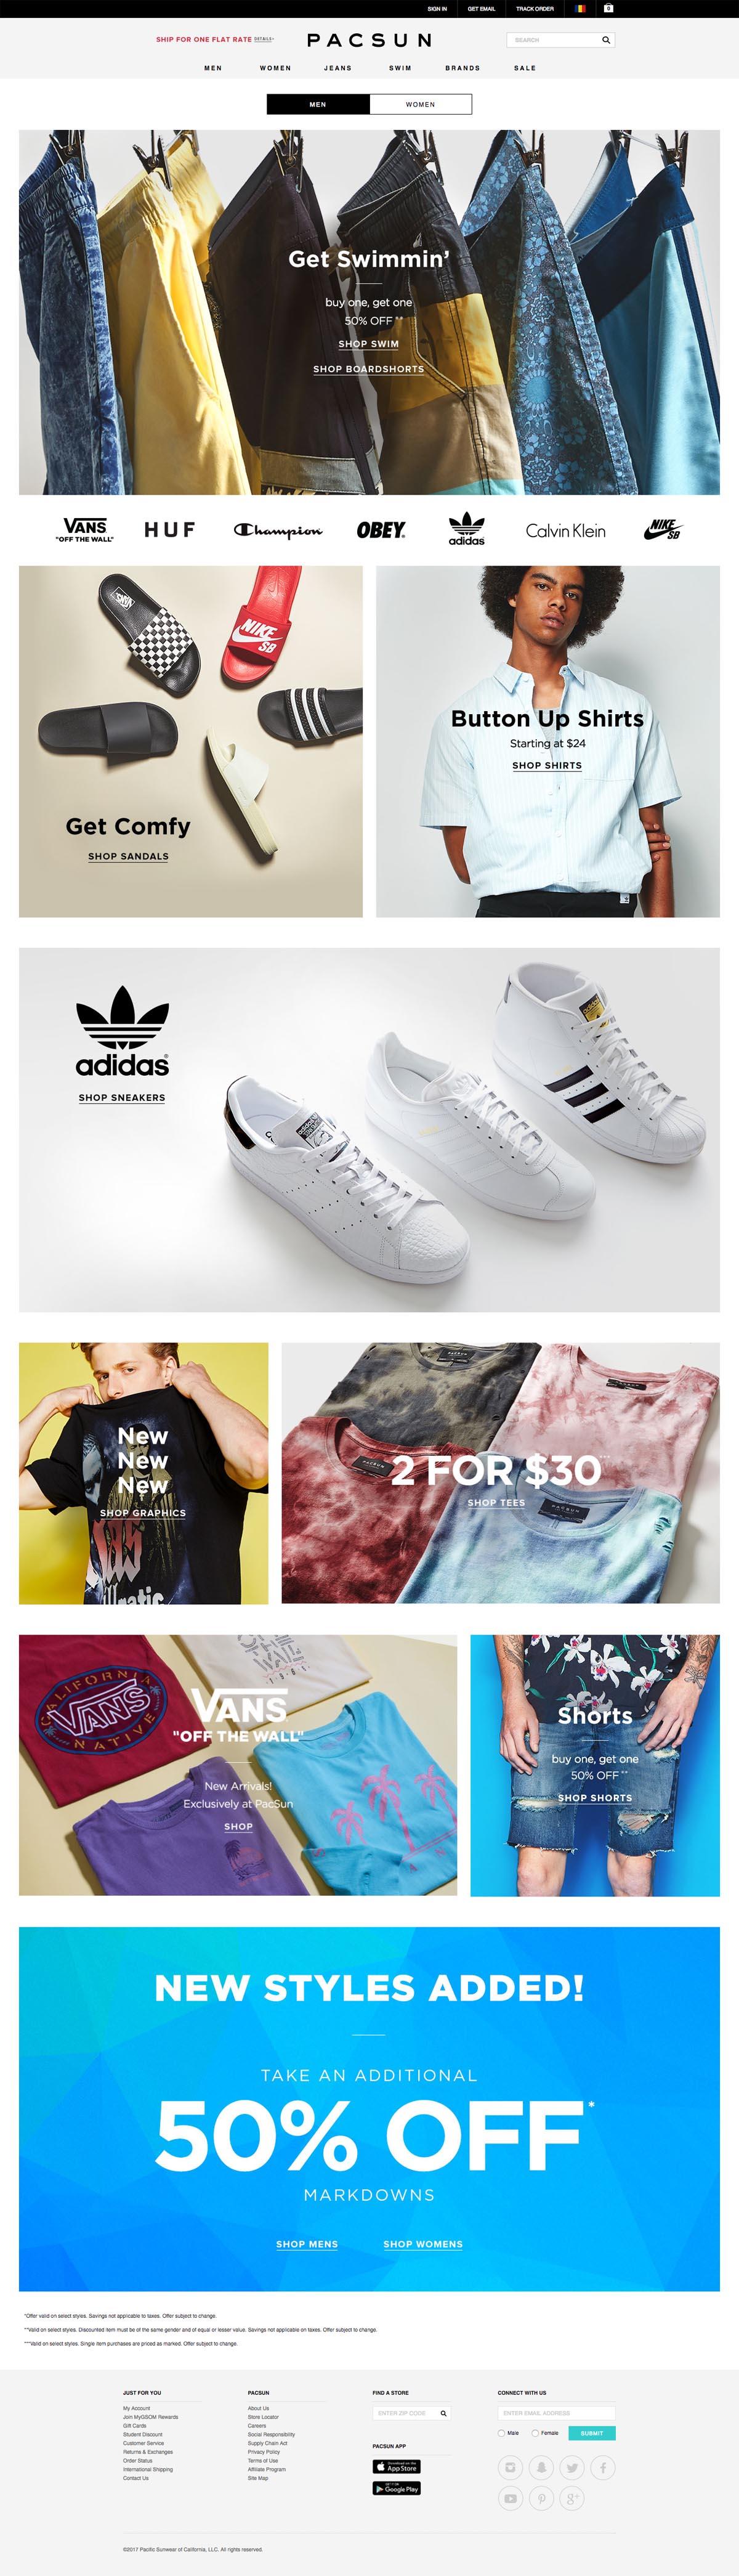 eCommerce website: PacSun